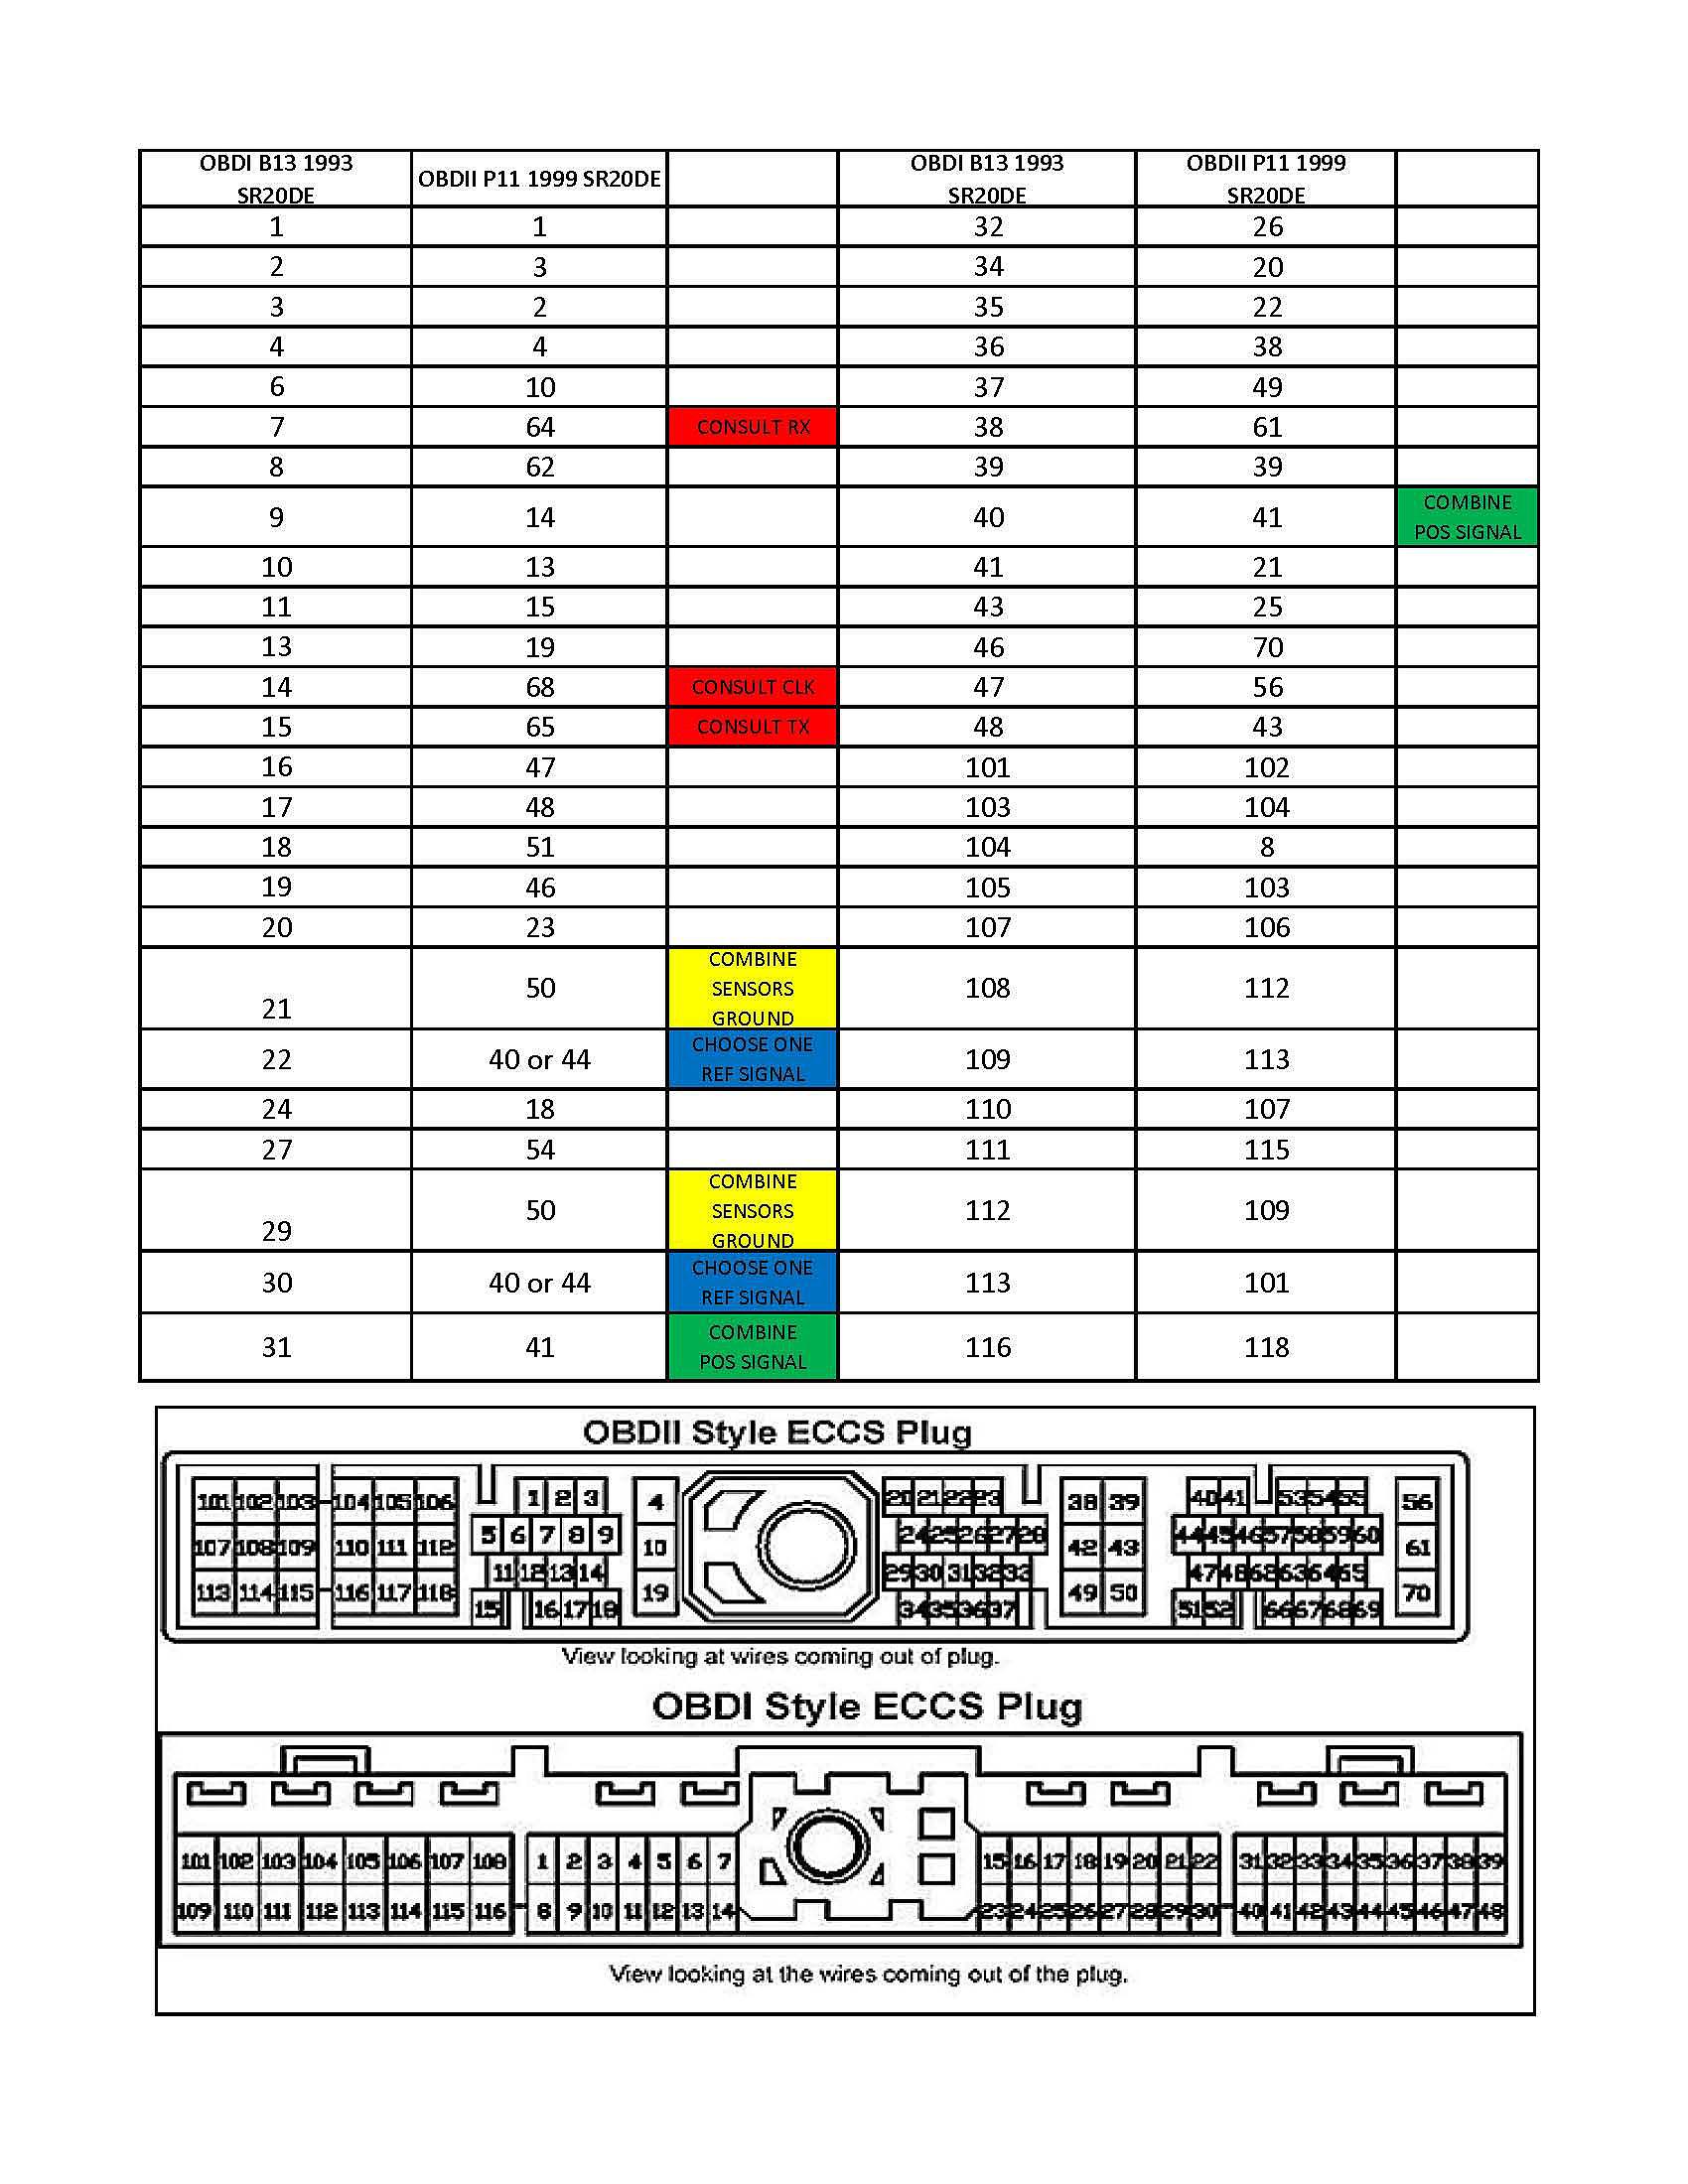 Output Speed Sensor Circuit Malfunction Http Wwwg20net Forum